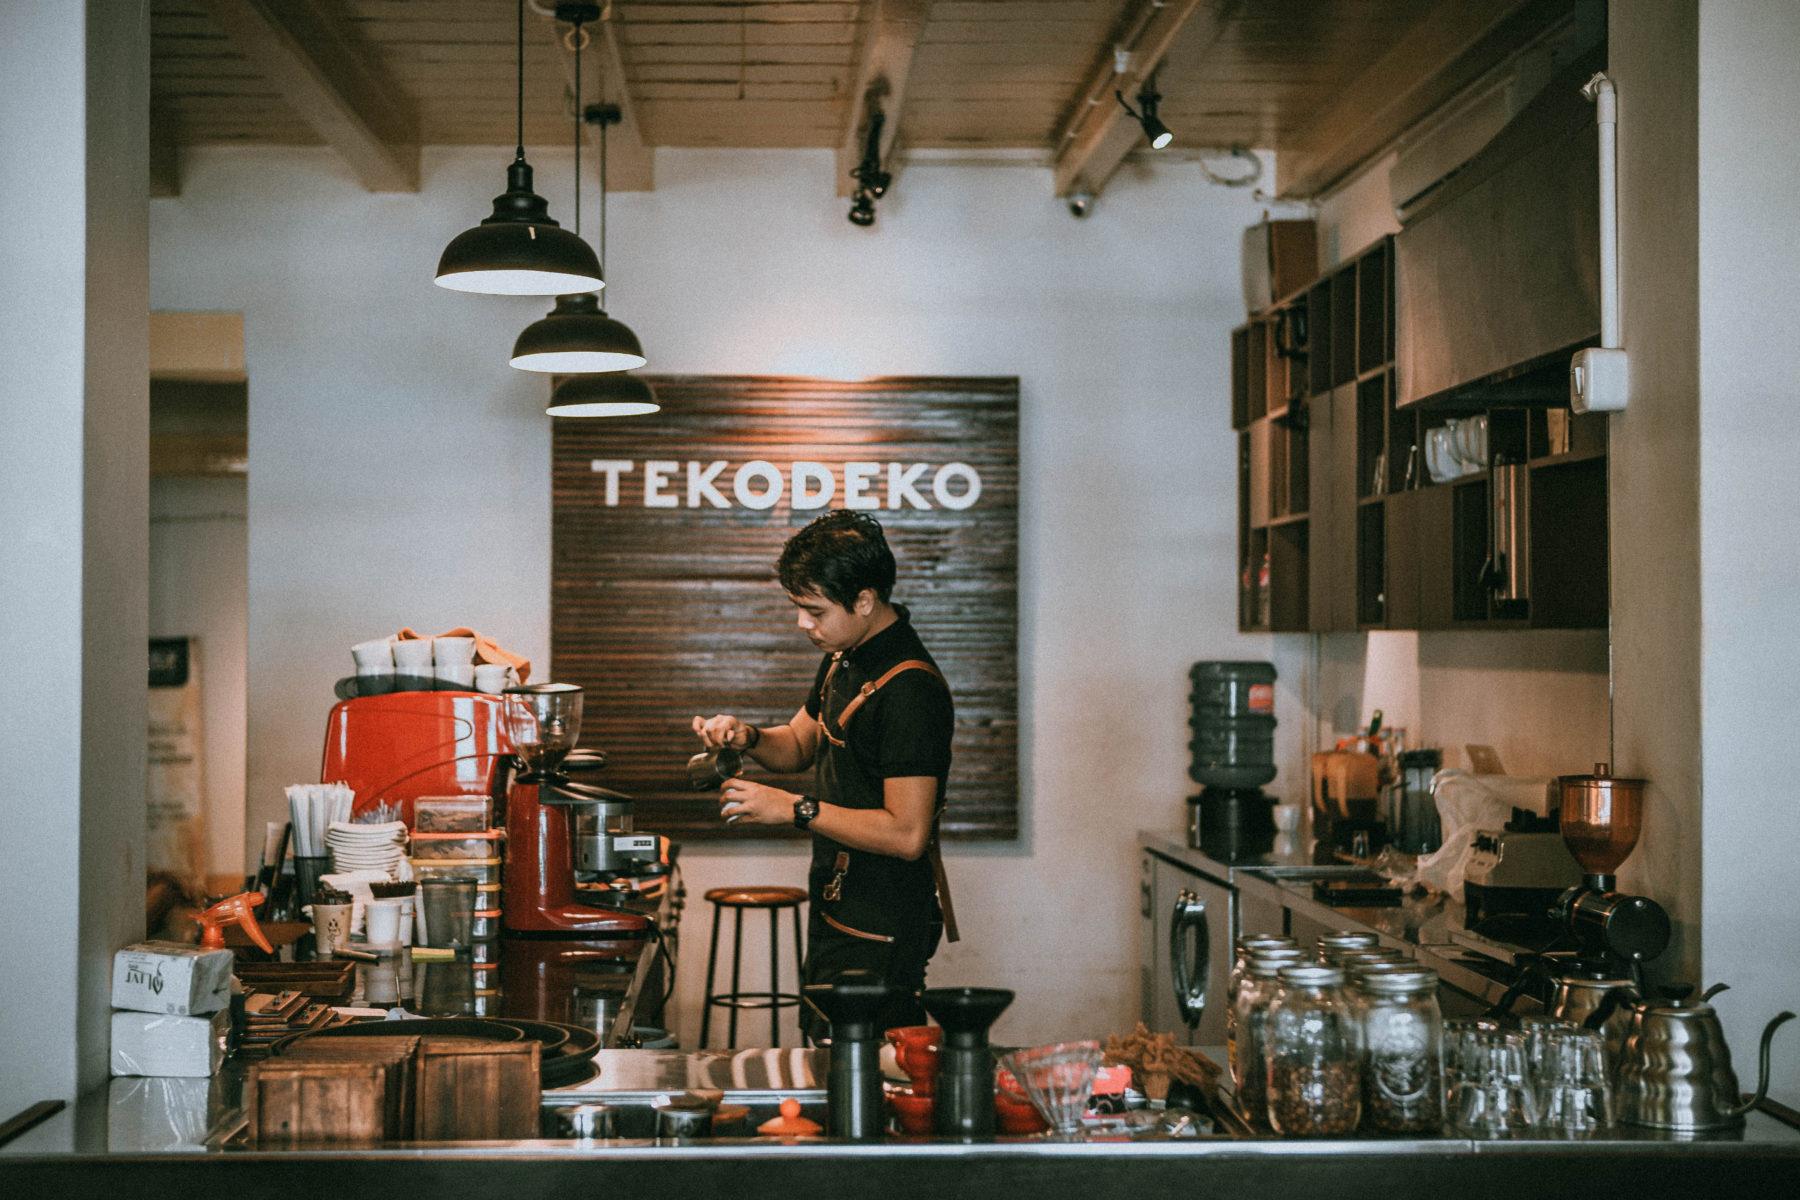 coffee shop flavour filter noch coffee indie hipster semarang tekodeko barista